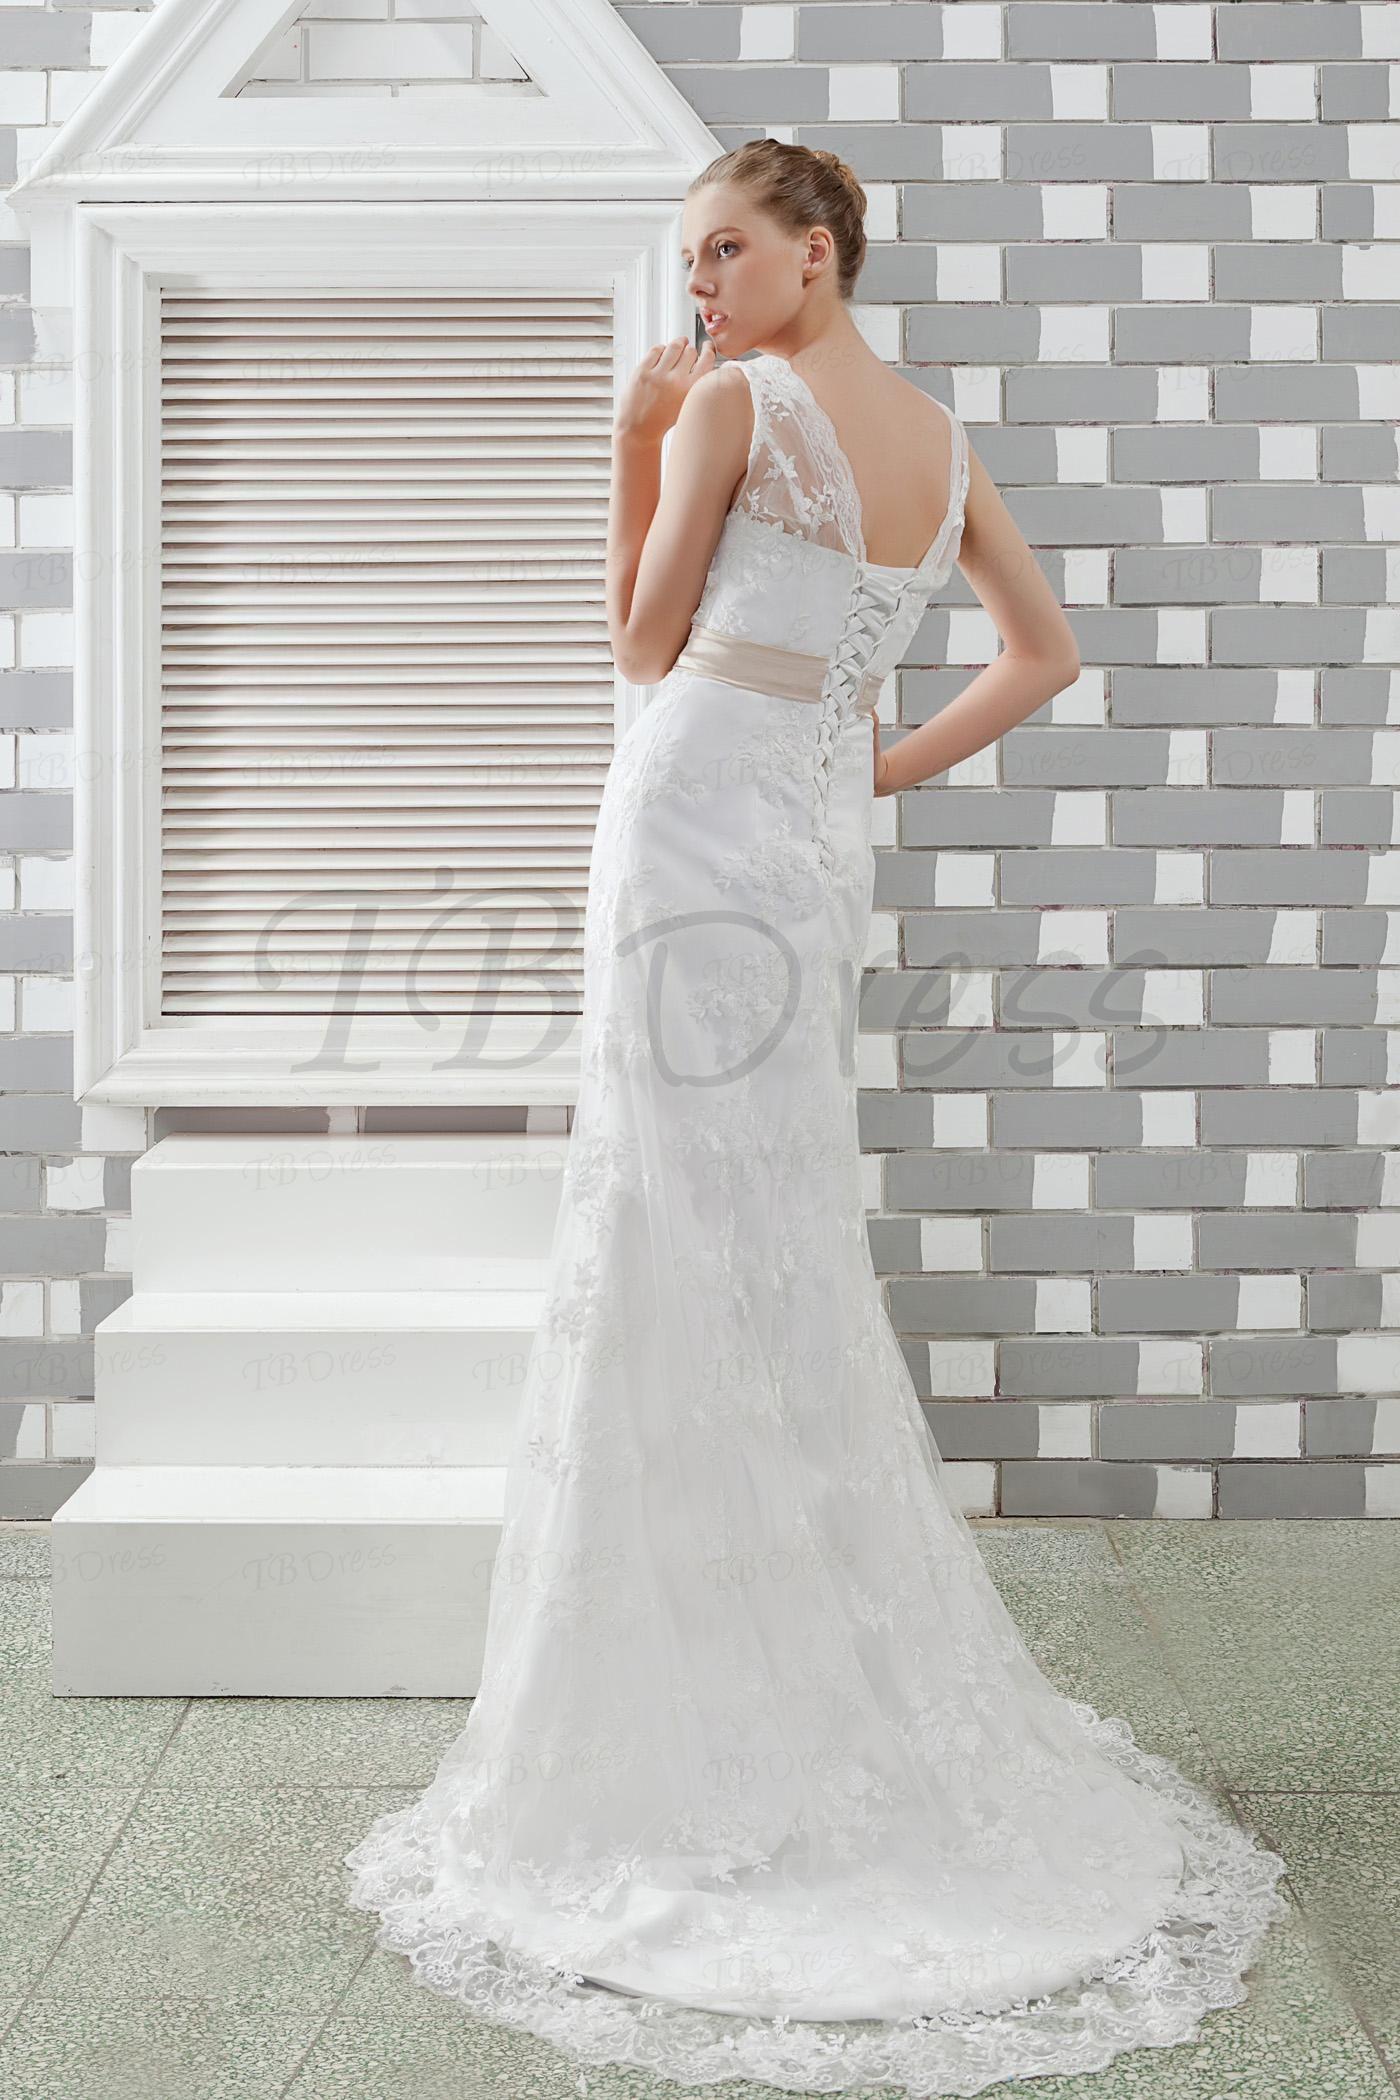 Tb Dresses Elegant Sheath Column Sleeveless V Neck Lace Vintage Anita S Wedding Dress